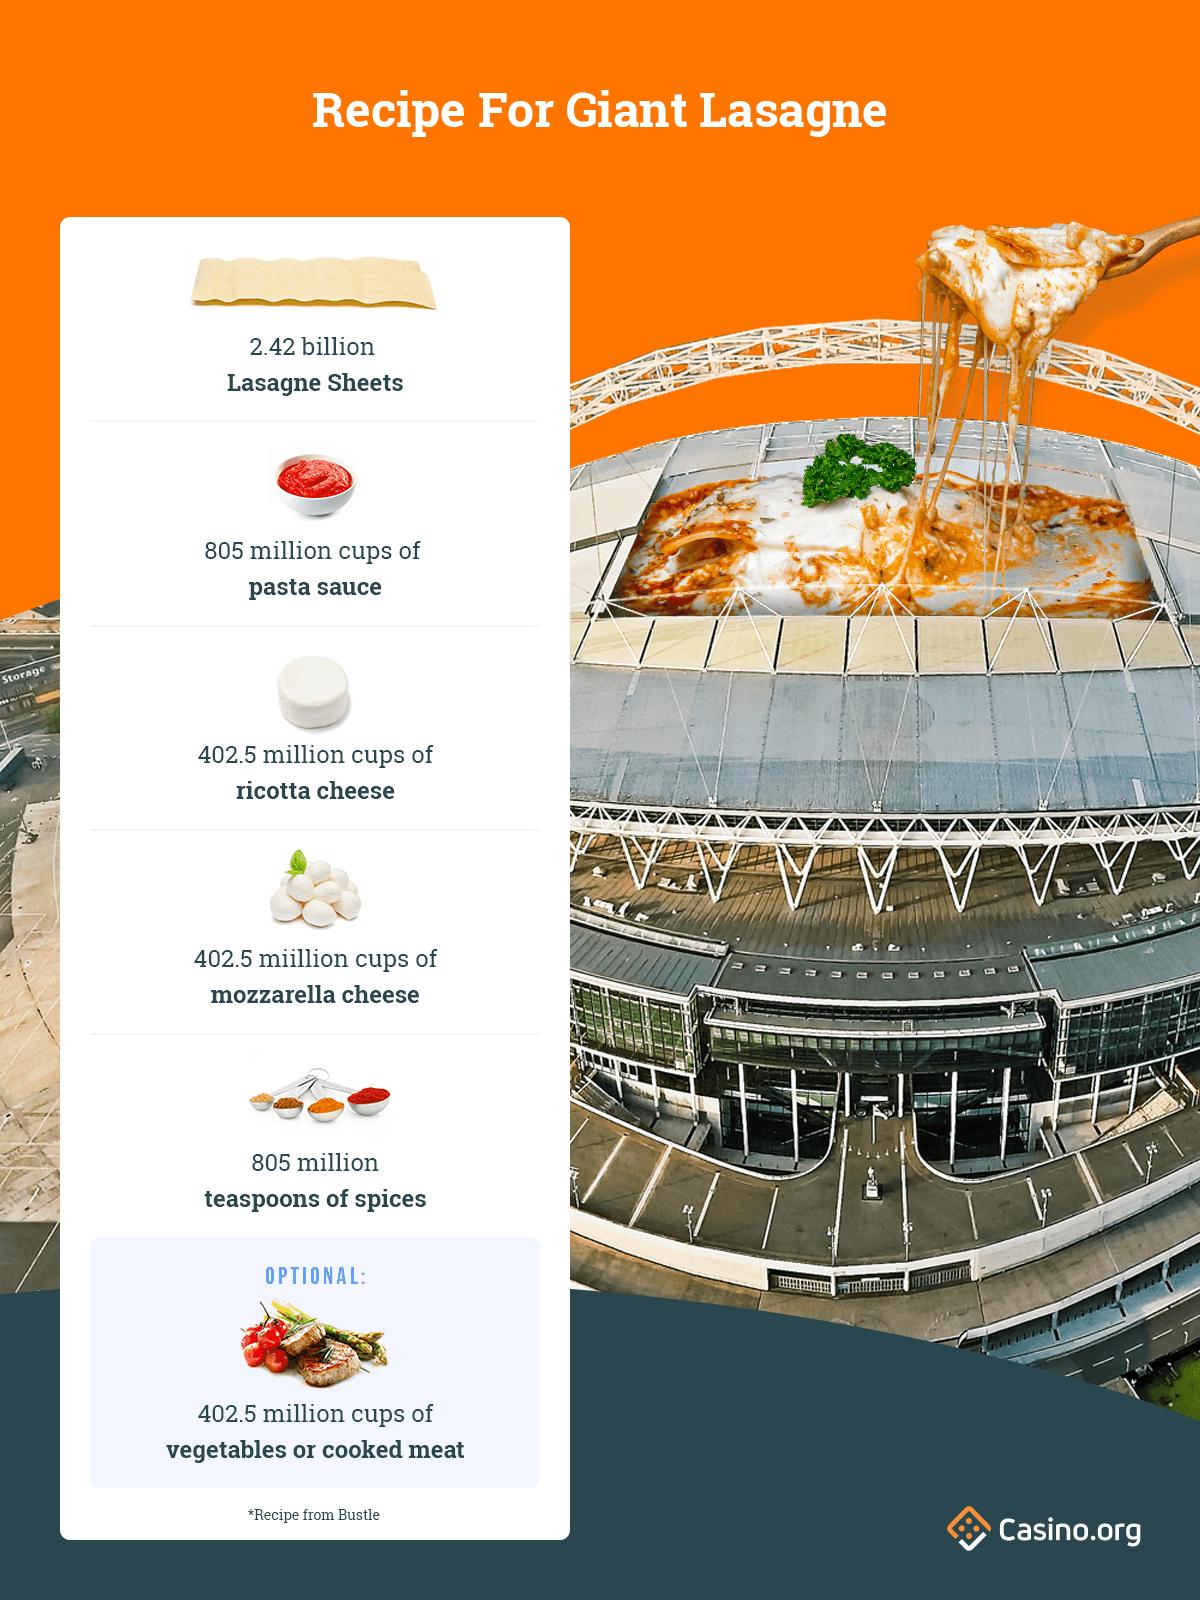 Massive lasagne Wembley Stadium prank